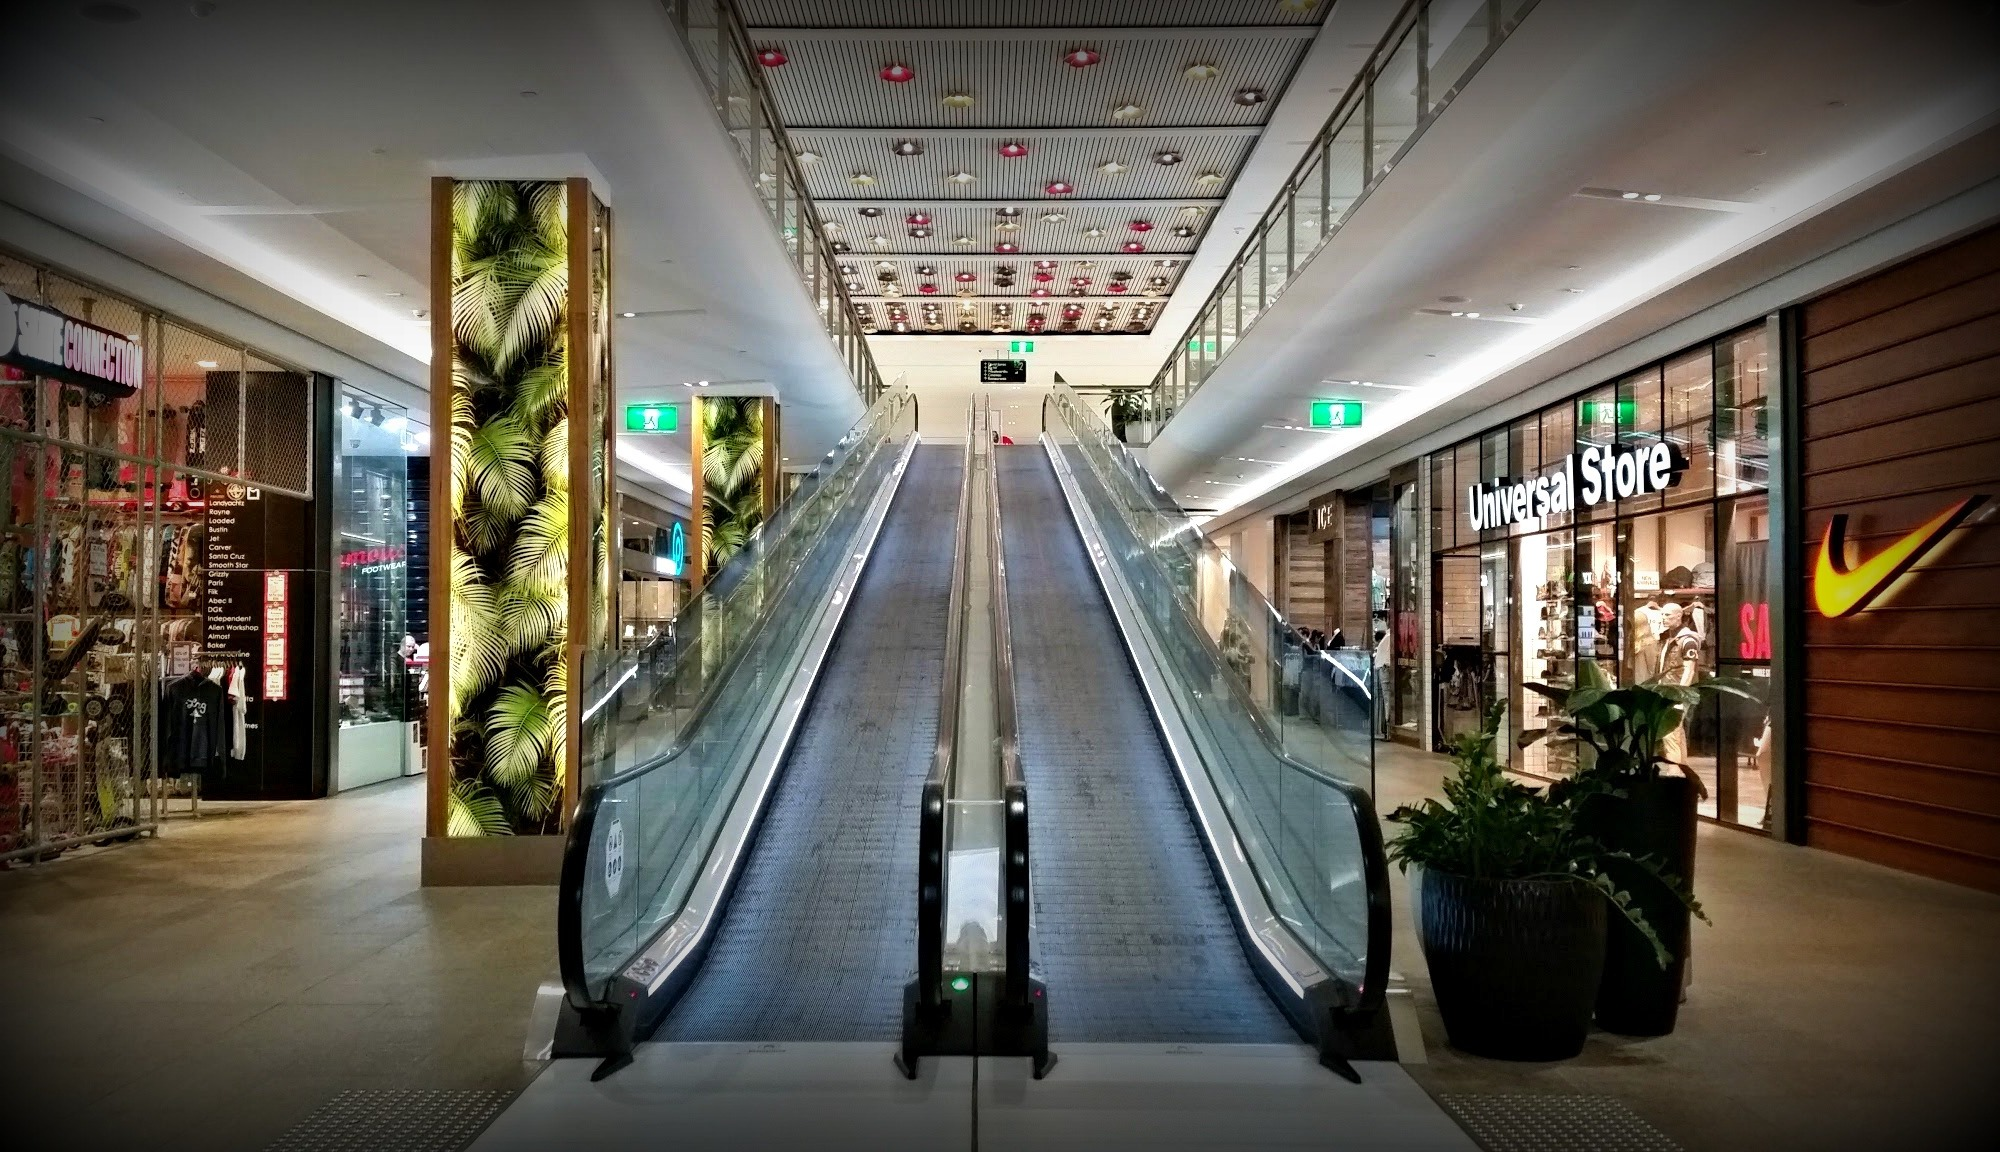 shopping center escalator in mall